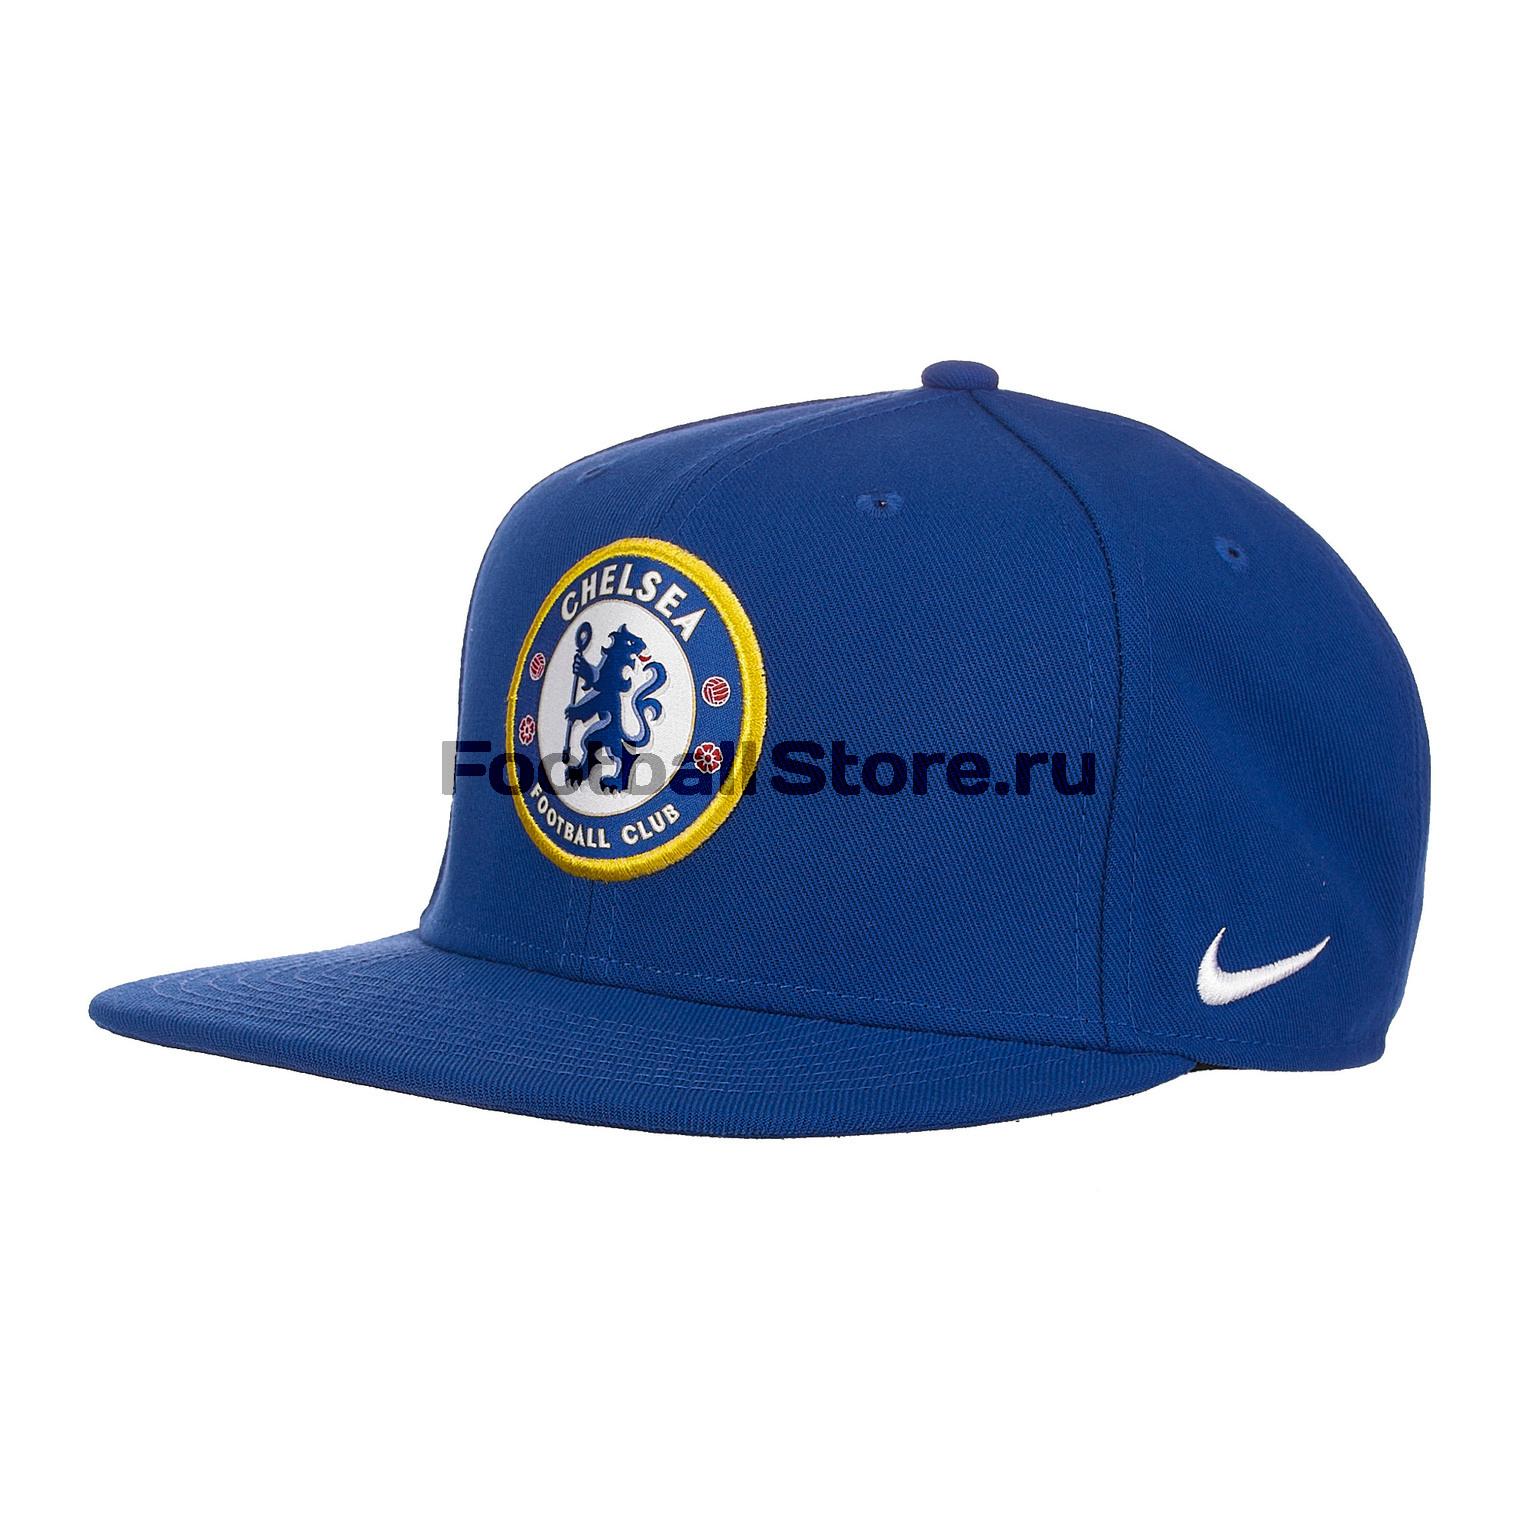 Бейсболка Nike Chelsea Pro Cap BV4267-495